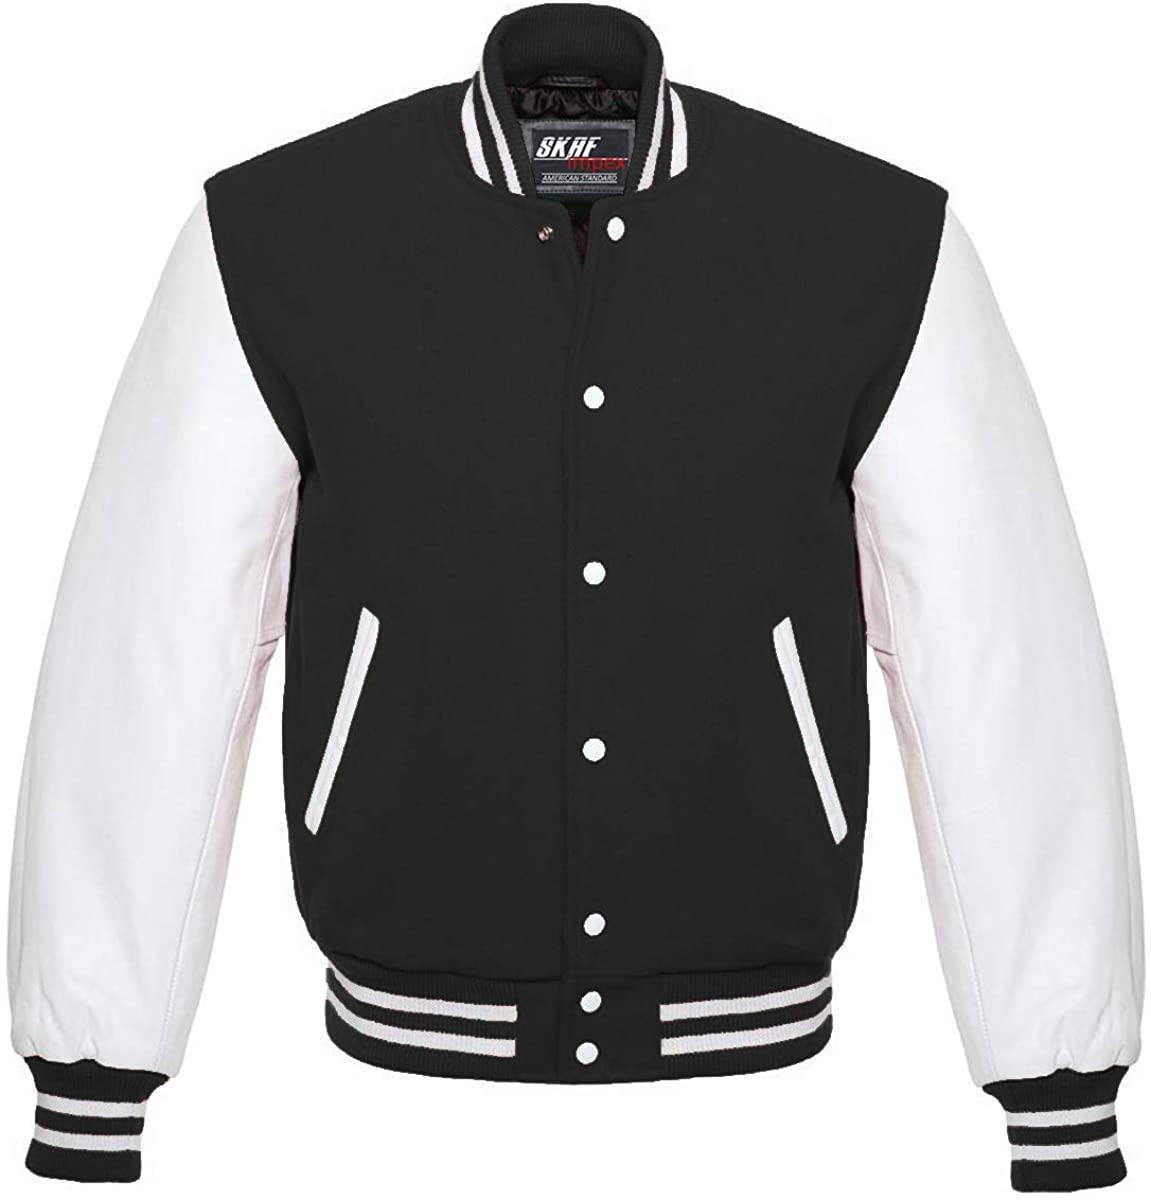 Skaf Impex Letterman Baseball Football Basketball College School Varsity Jacket Wool & Leather